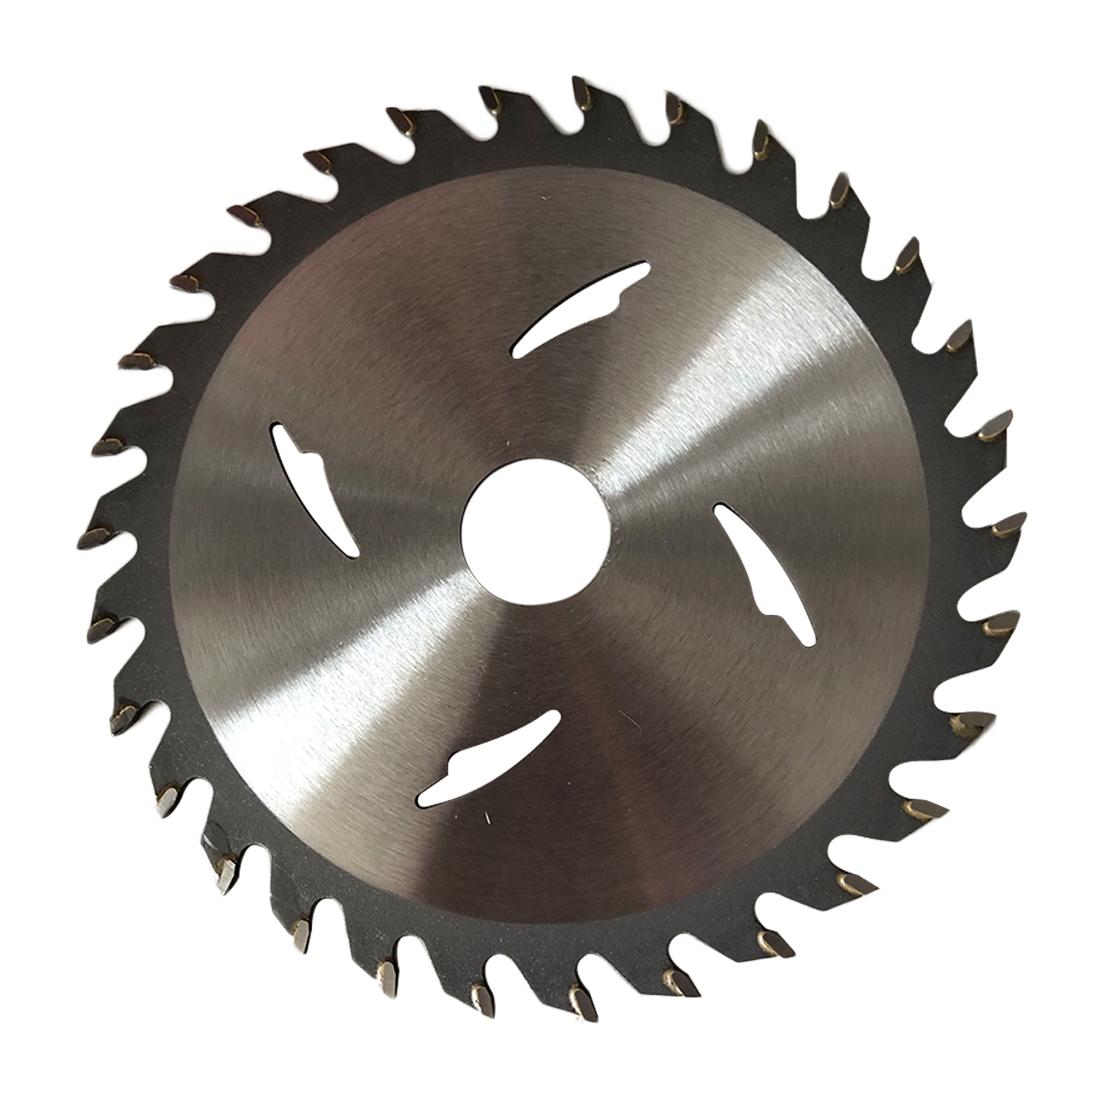 18 Teeth Diameter 54.8mm Circular TCT Saw Blade Concrete Cement Wood Cutting